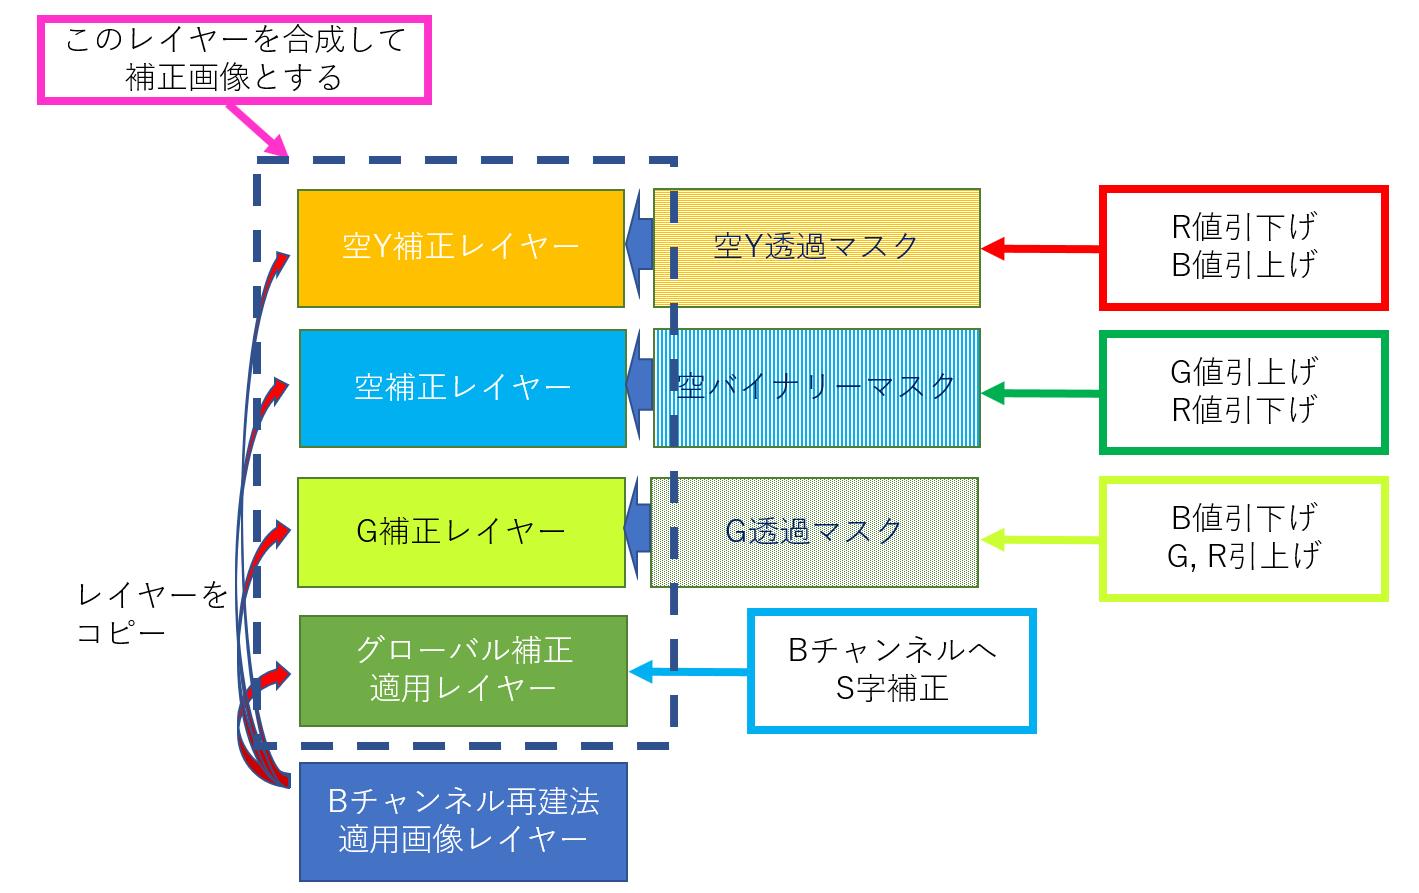 f:id:yasuo_ssi:20210616213203p:plain